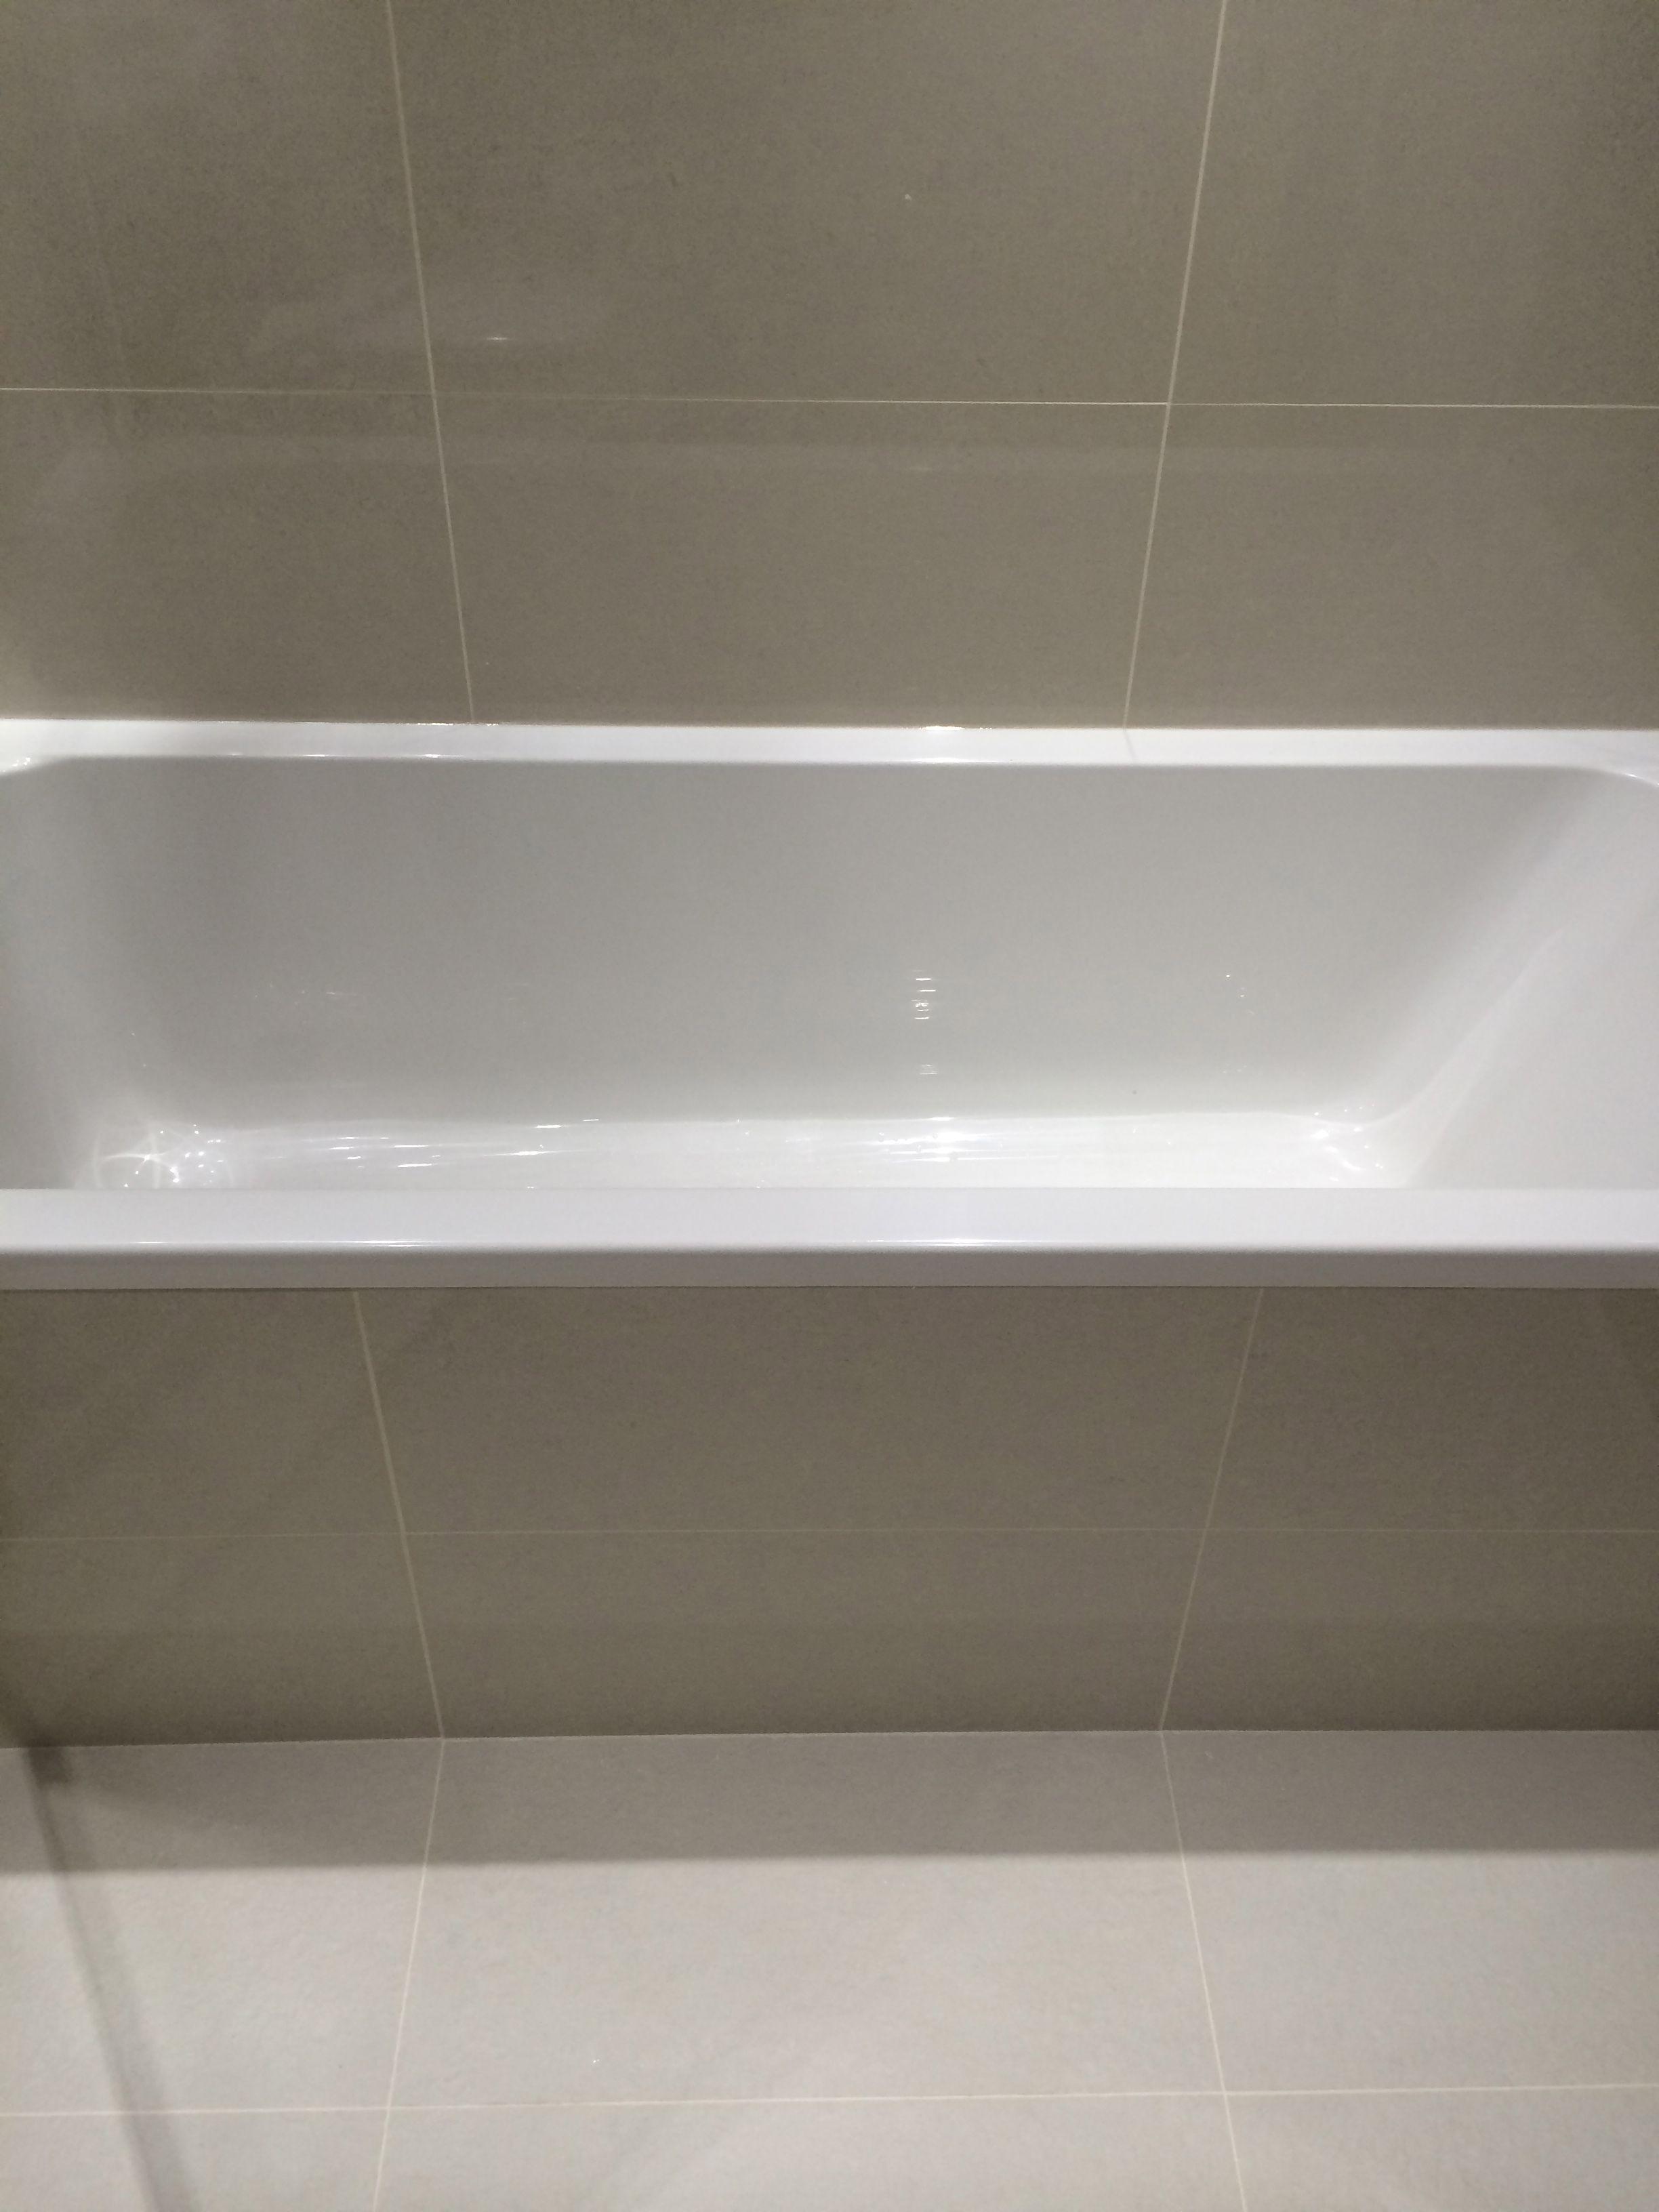 Bathroom Refit In Canary Wharf London Tiles X Mm Throughout - Bathroom refit